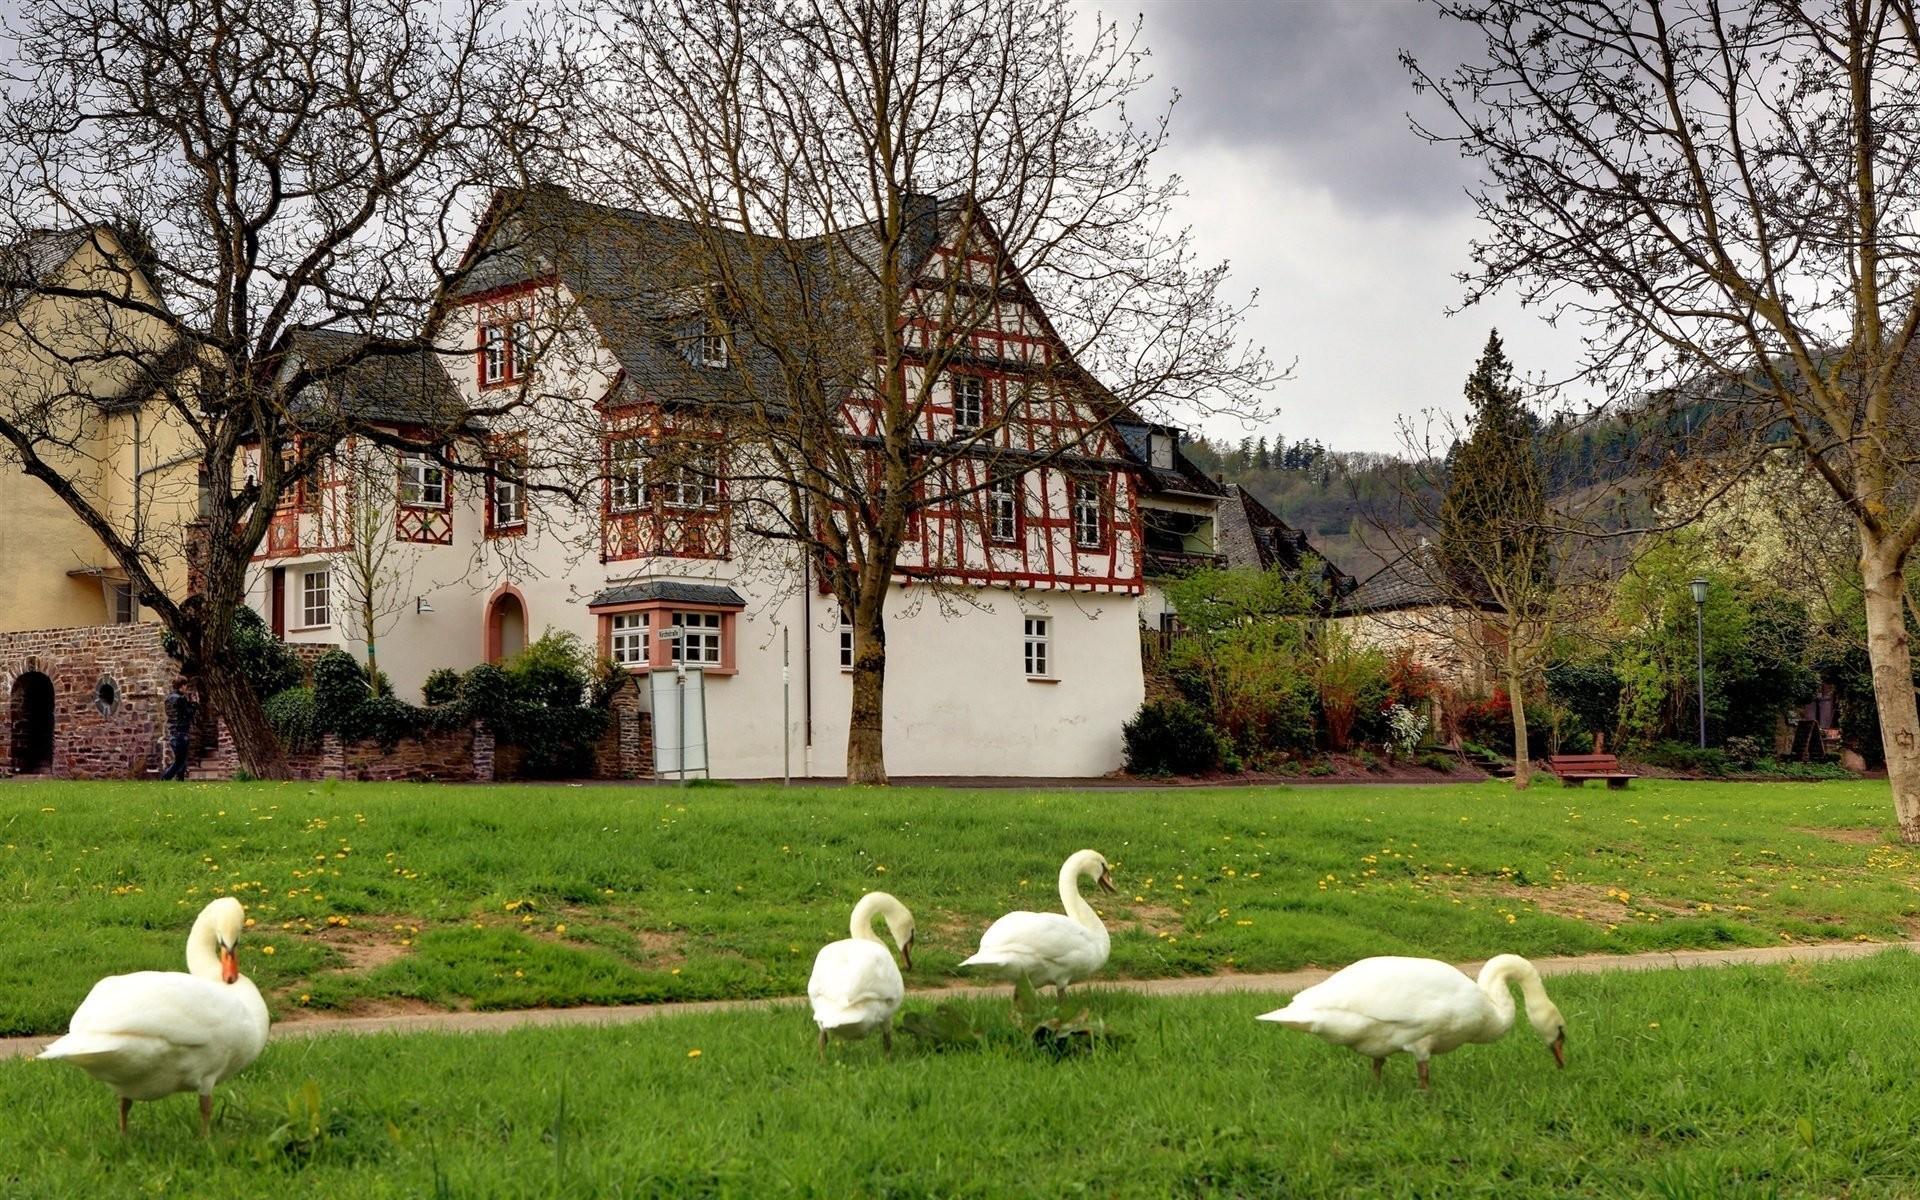 germany village swans tree grass bench landscape